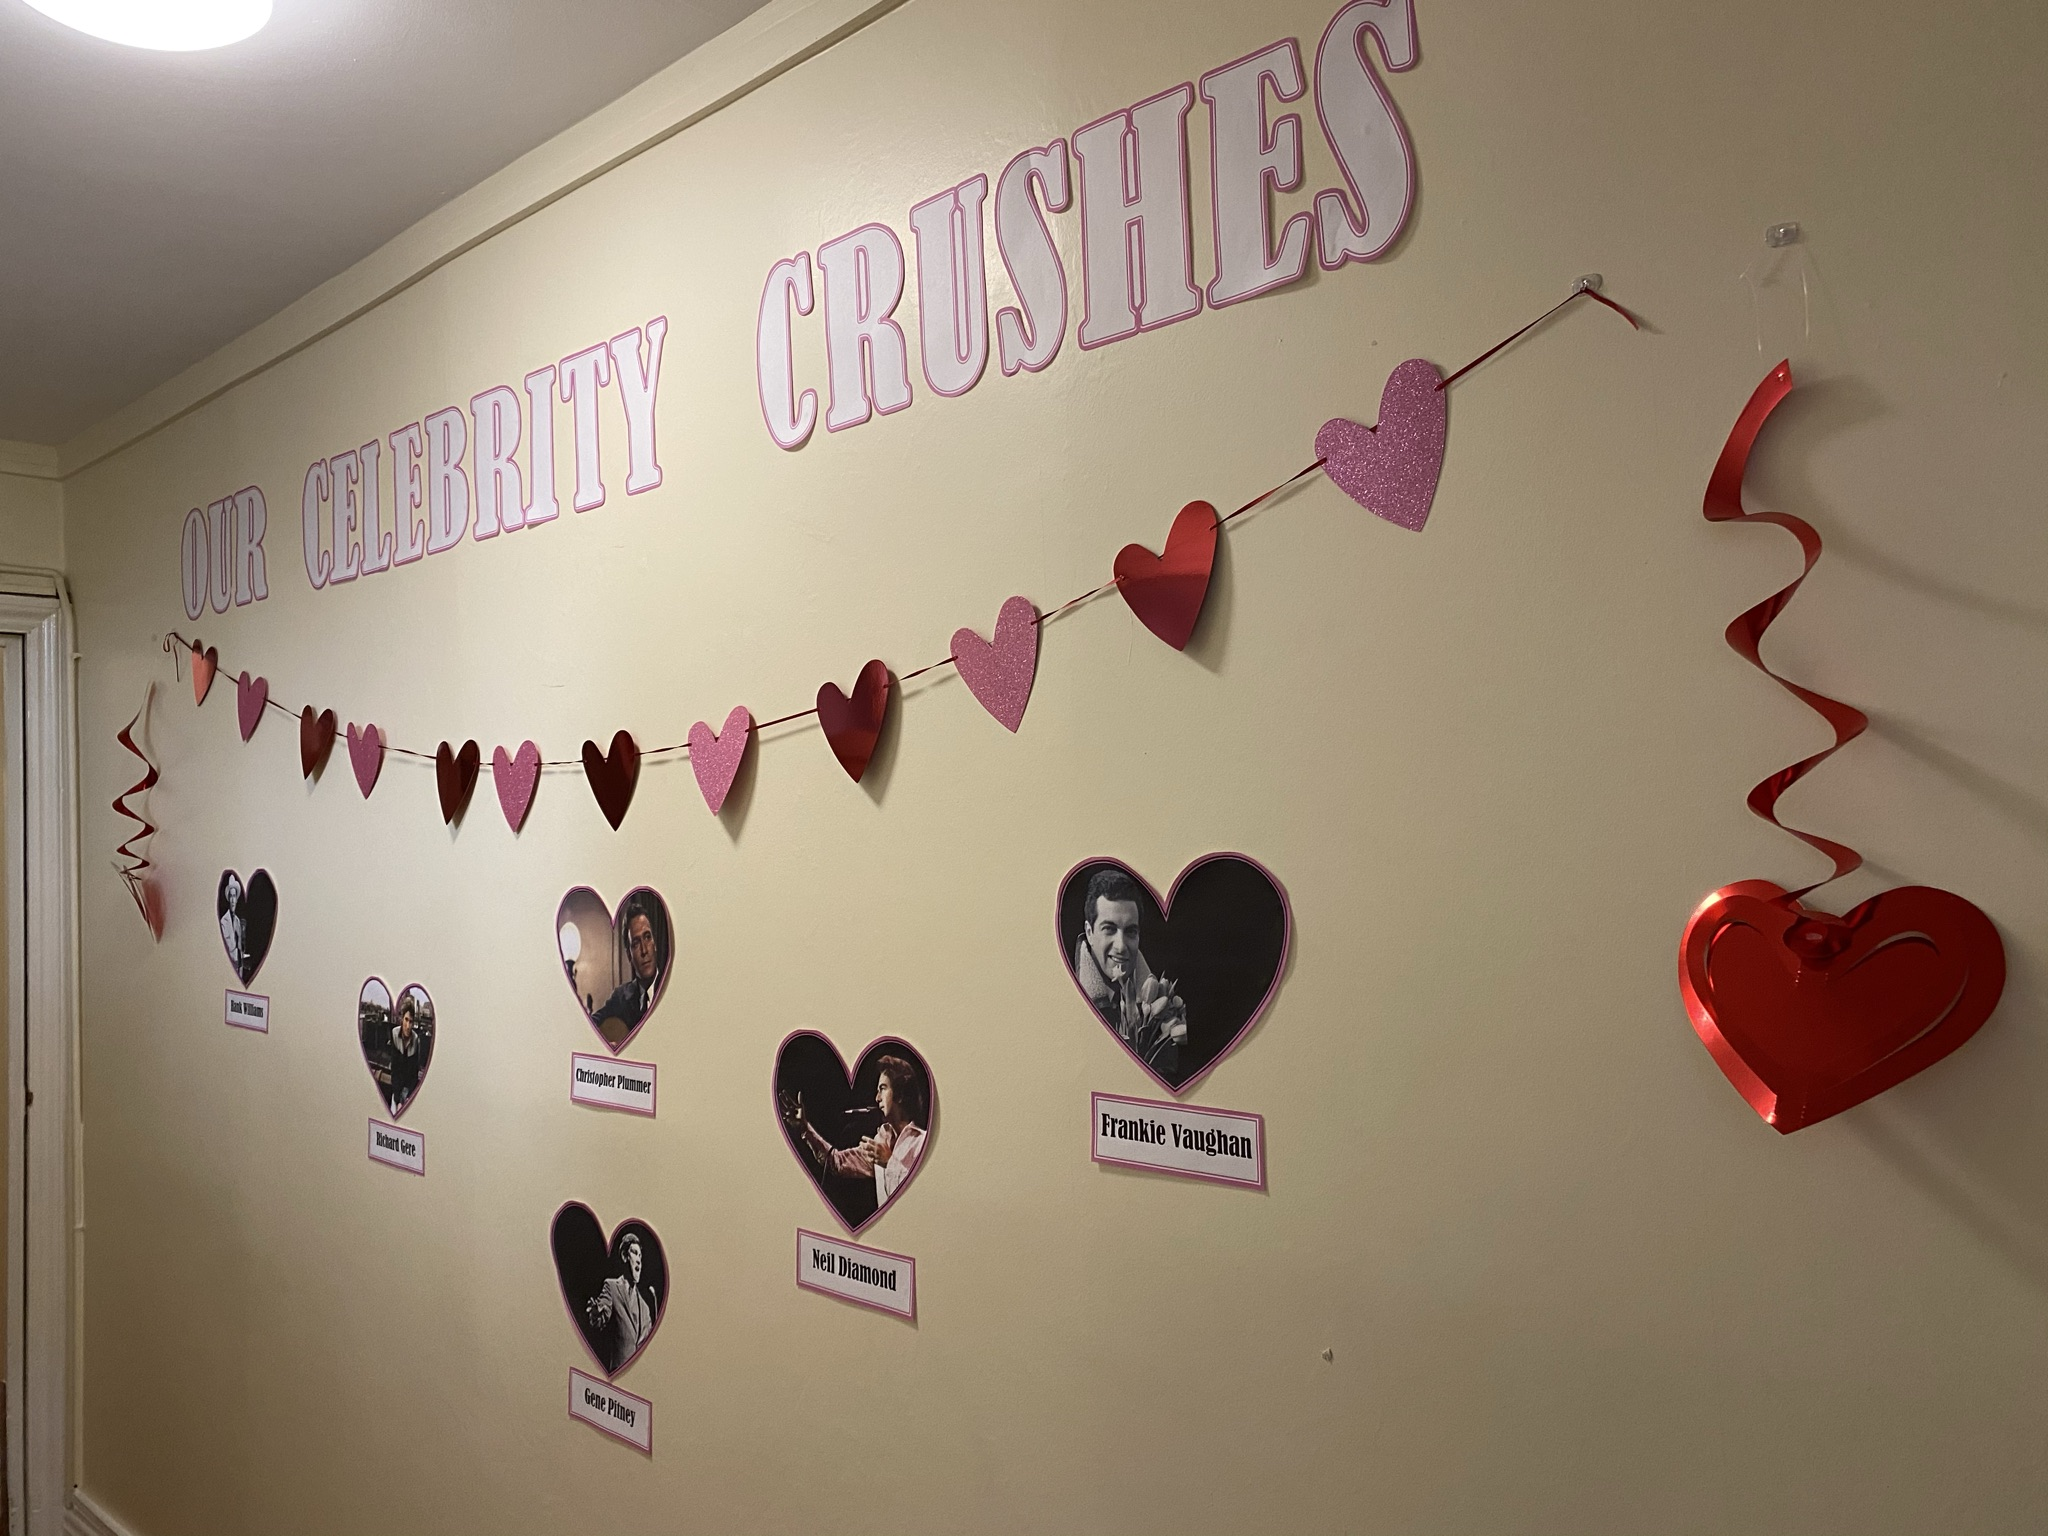 Valentines Day - 14.02.21